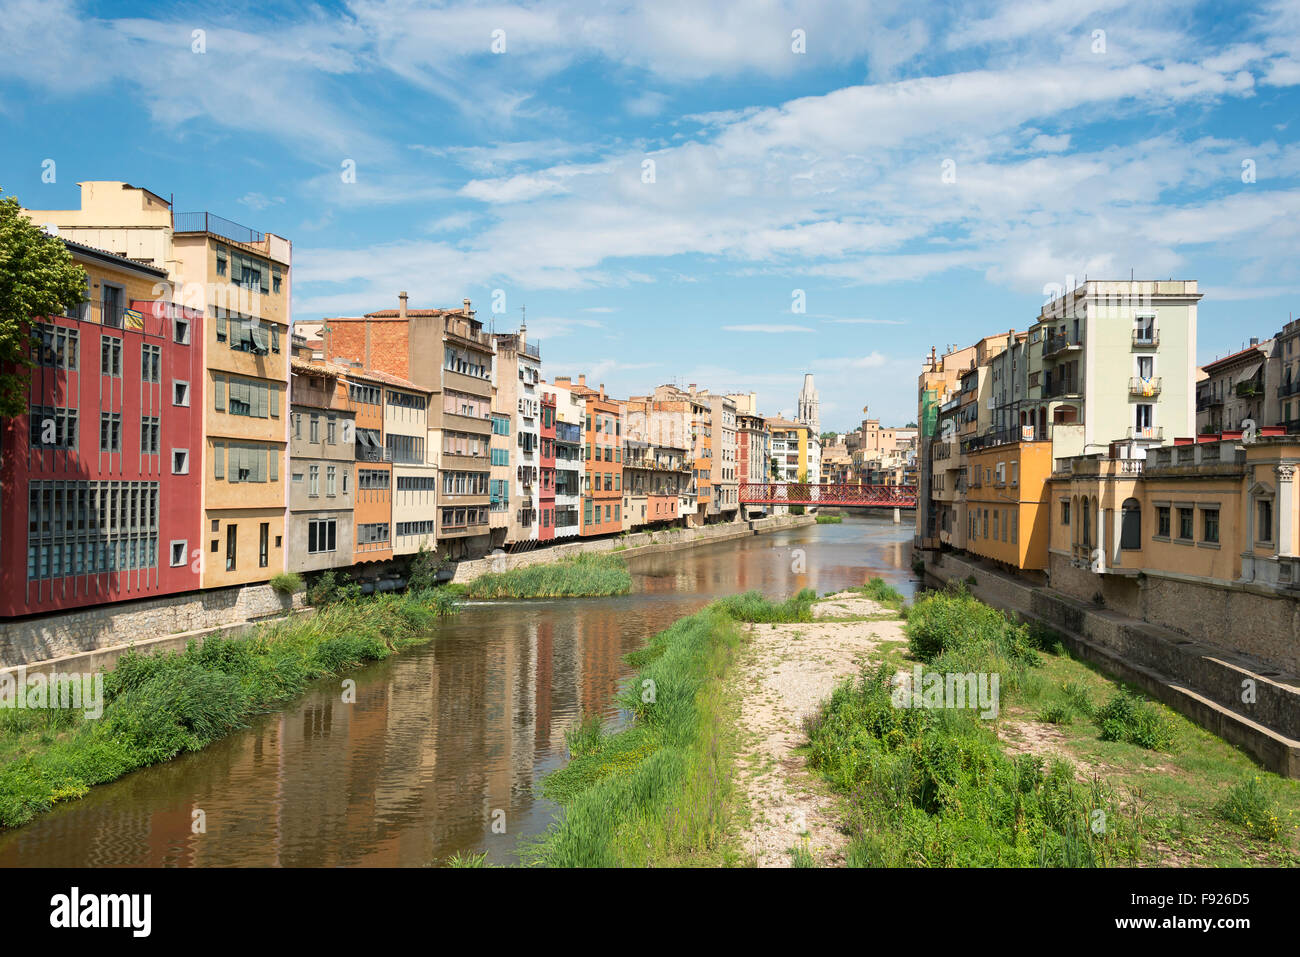 Onyar River and Old Town, Girona (Gerona), Province of Girona, Catalonia, Spain Stock Photo